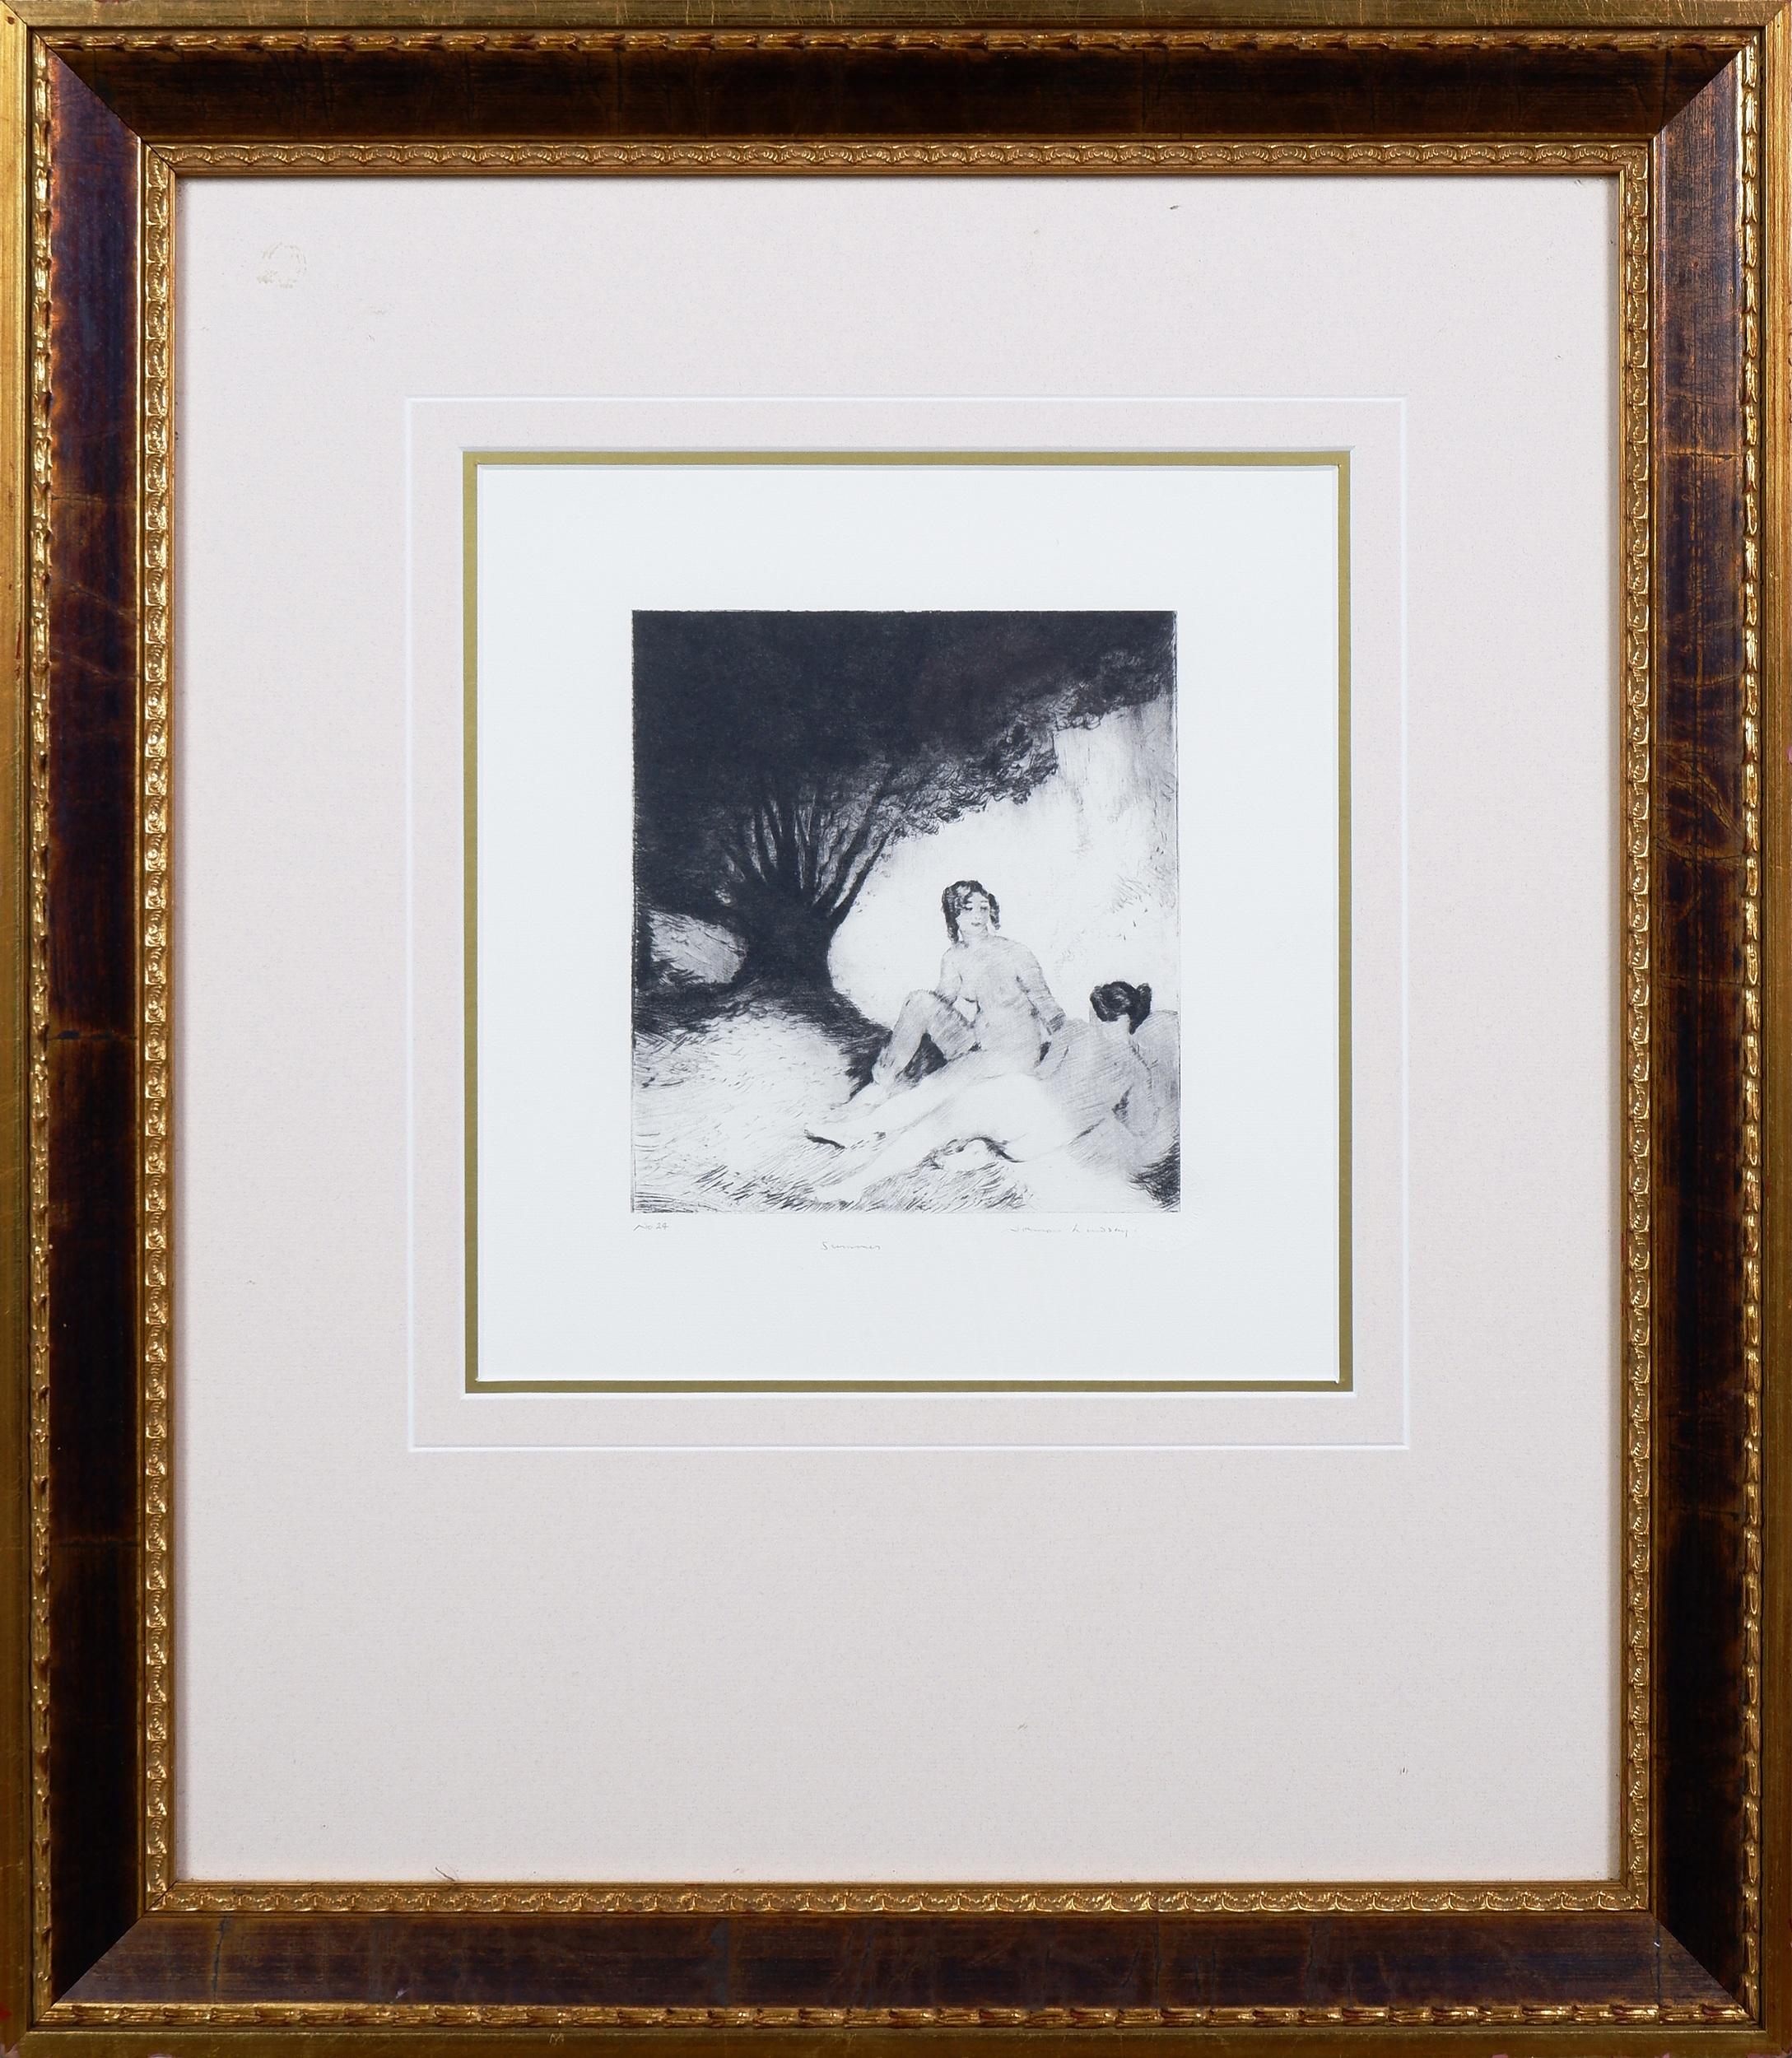 'Norman Lindsay (1879-1969), Summer, Facsimilie Etching'